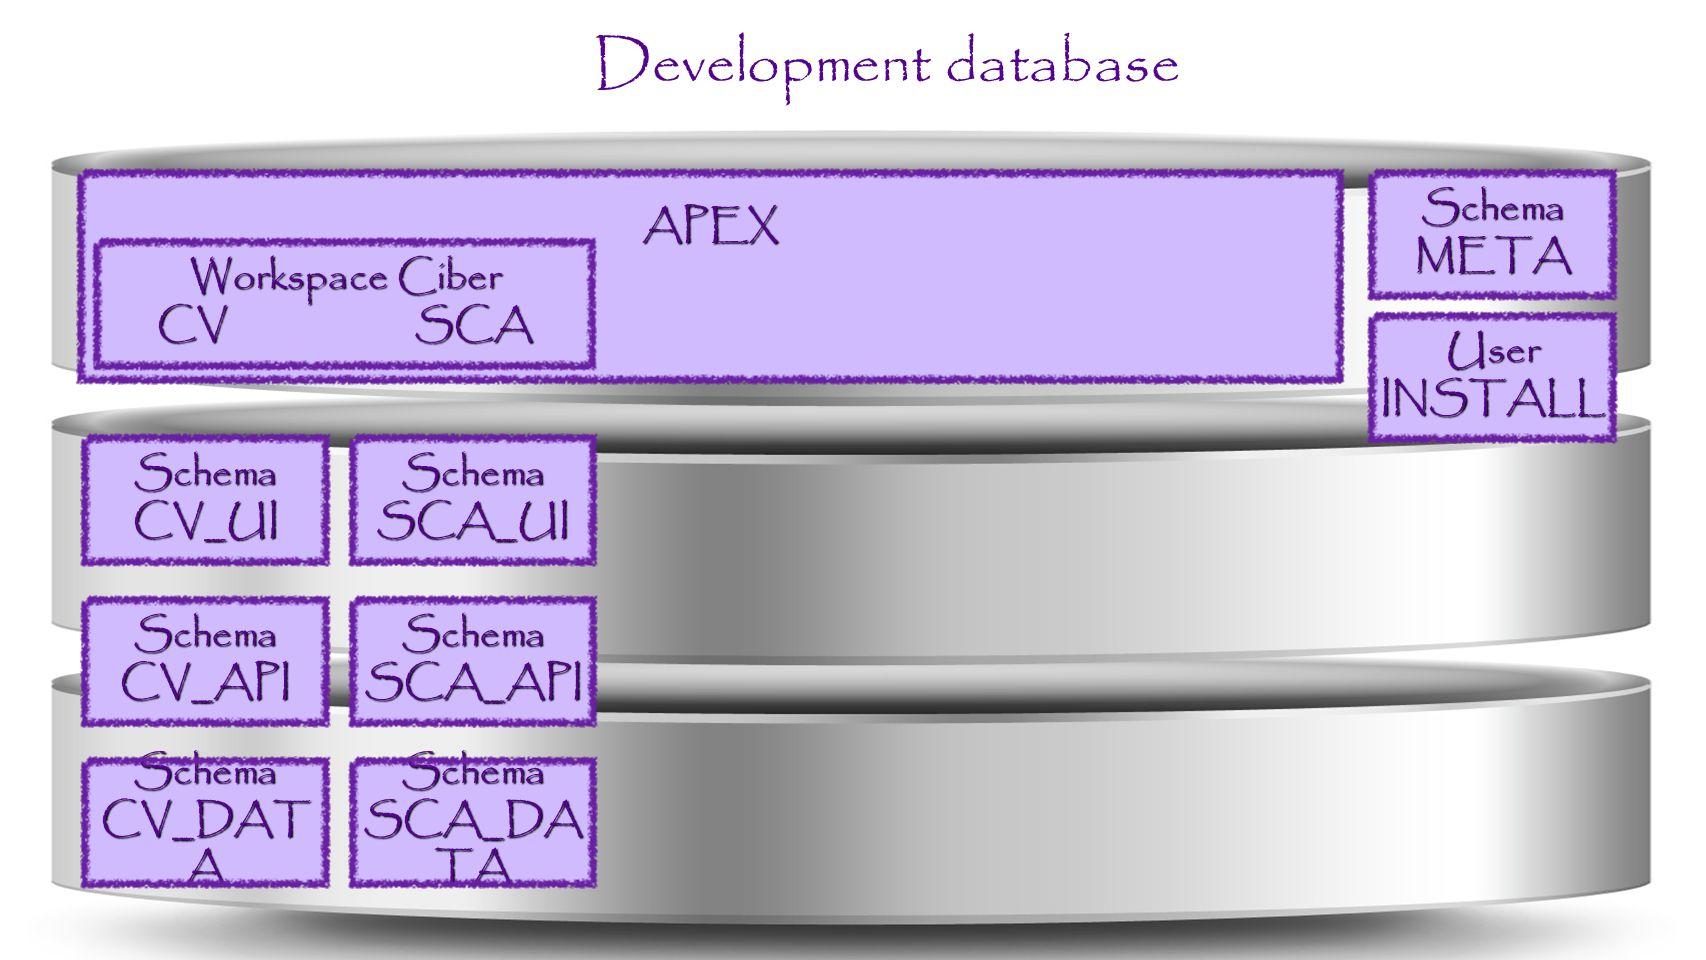 Development database APEX Workspace Ciber CV SCA SchemaSCA_UI SchemaSCA_API Schema SCA_DA TA SchemaCV_UI SchemaCV_API Schema CV_DAT A SchemaMETA User INSTALL